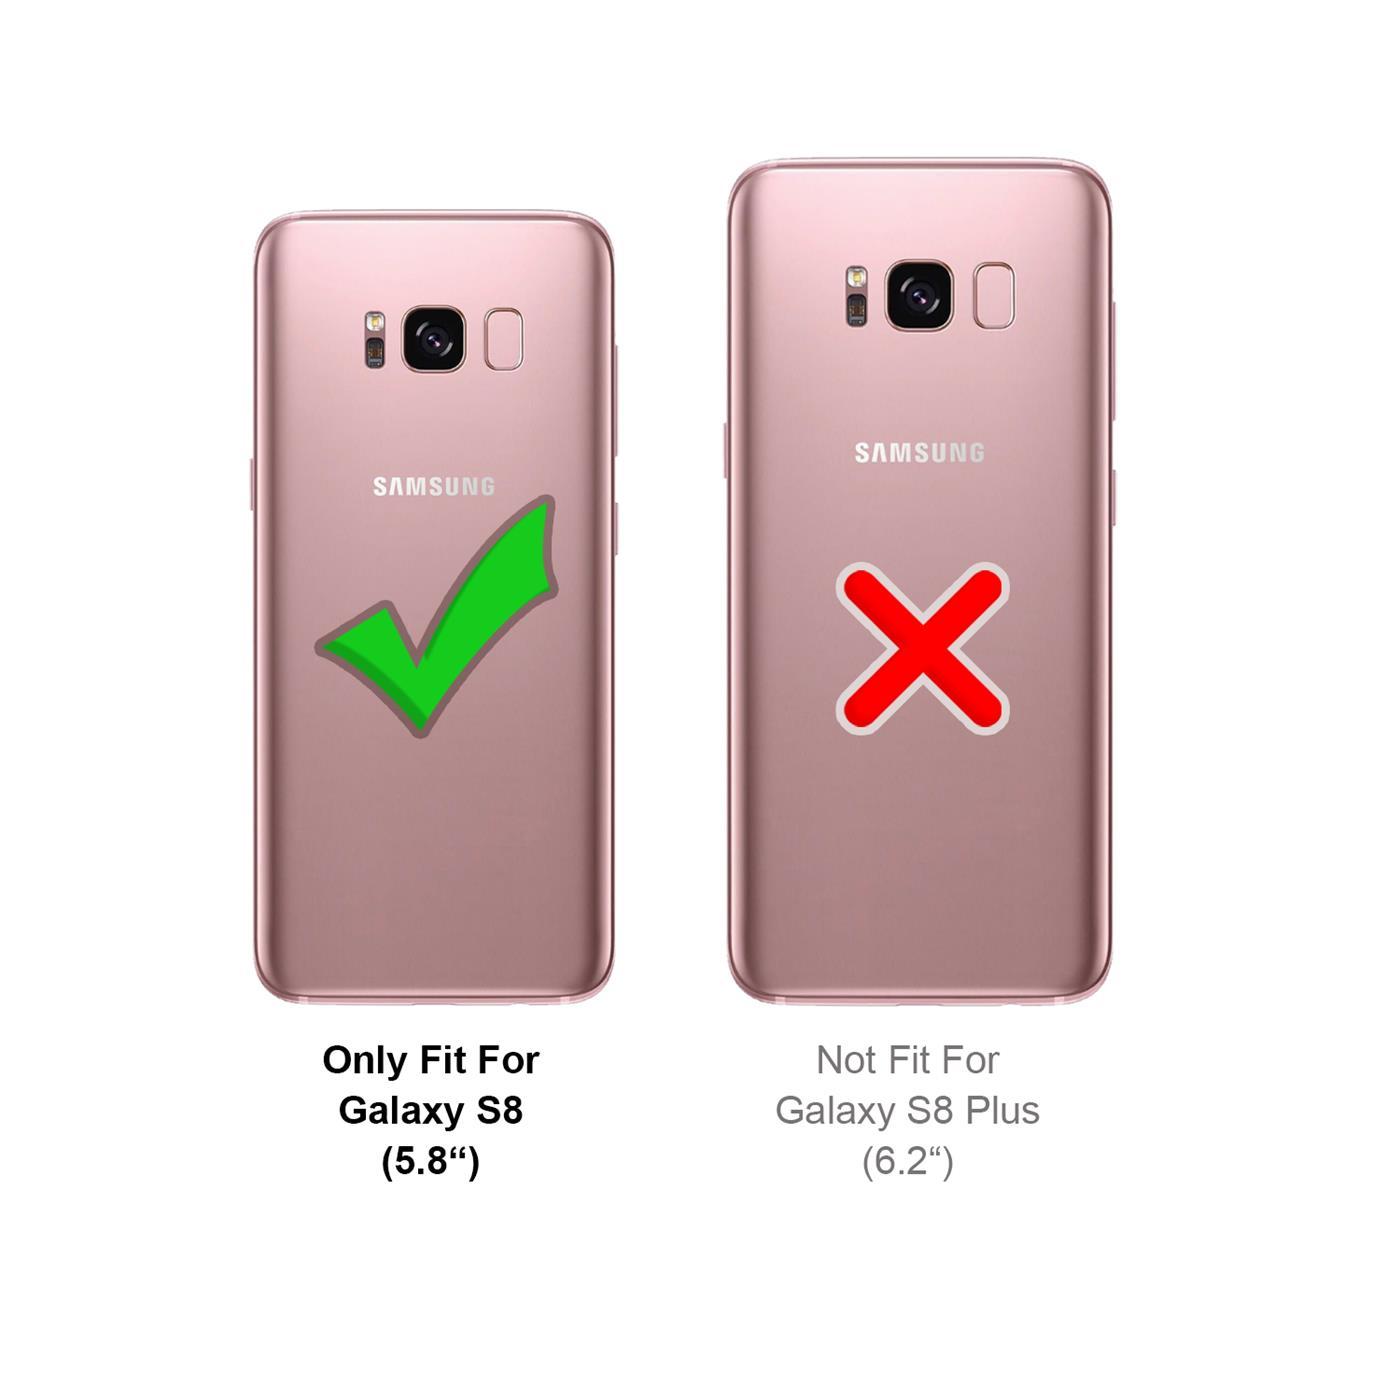 Hard-Back-Case-Cover-Samsung-Galaxy-s4-duenn-Cover-Slim-Shockproof-Rugged Indexbild 11